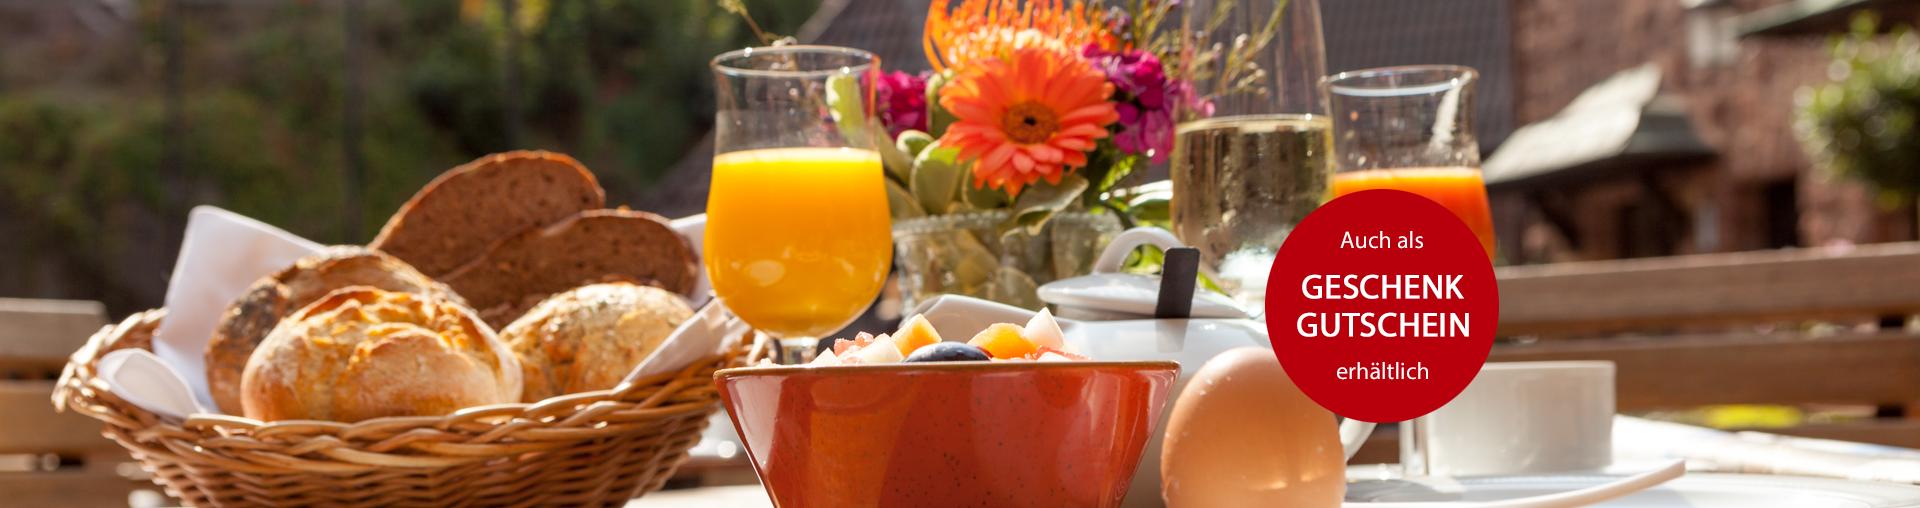 Bild zu Burgfrühstück